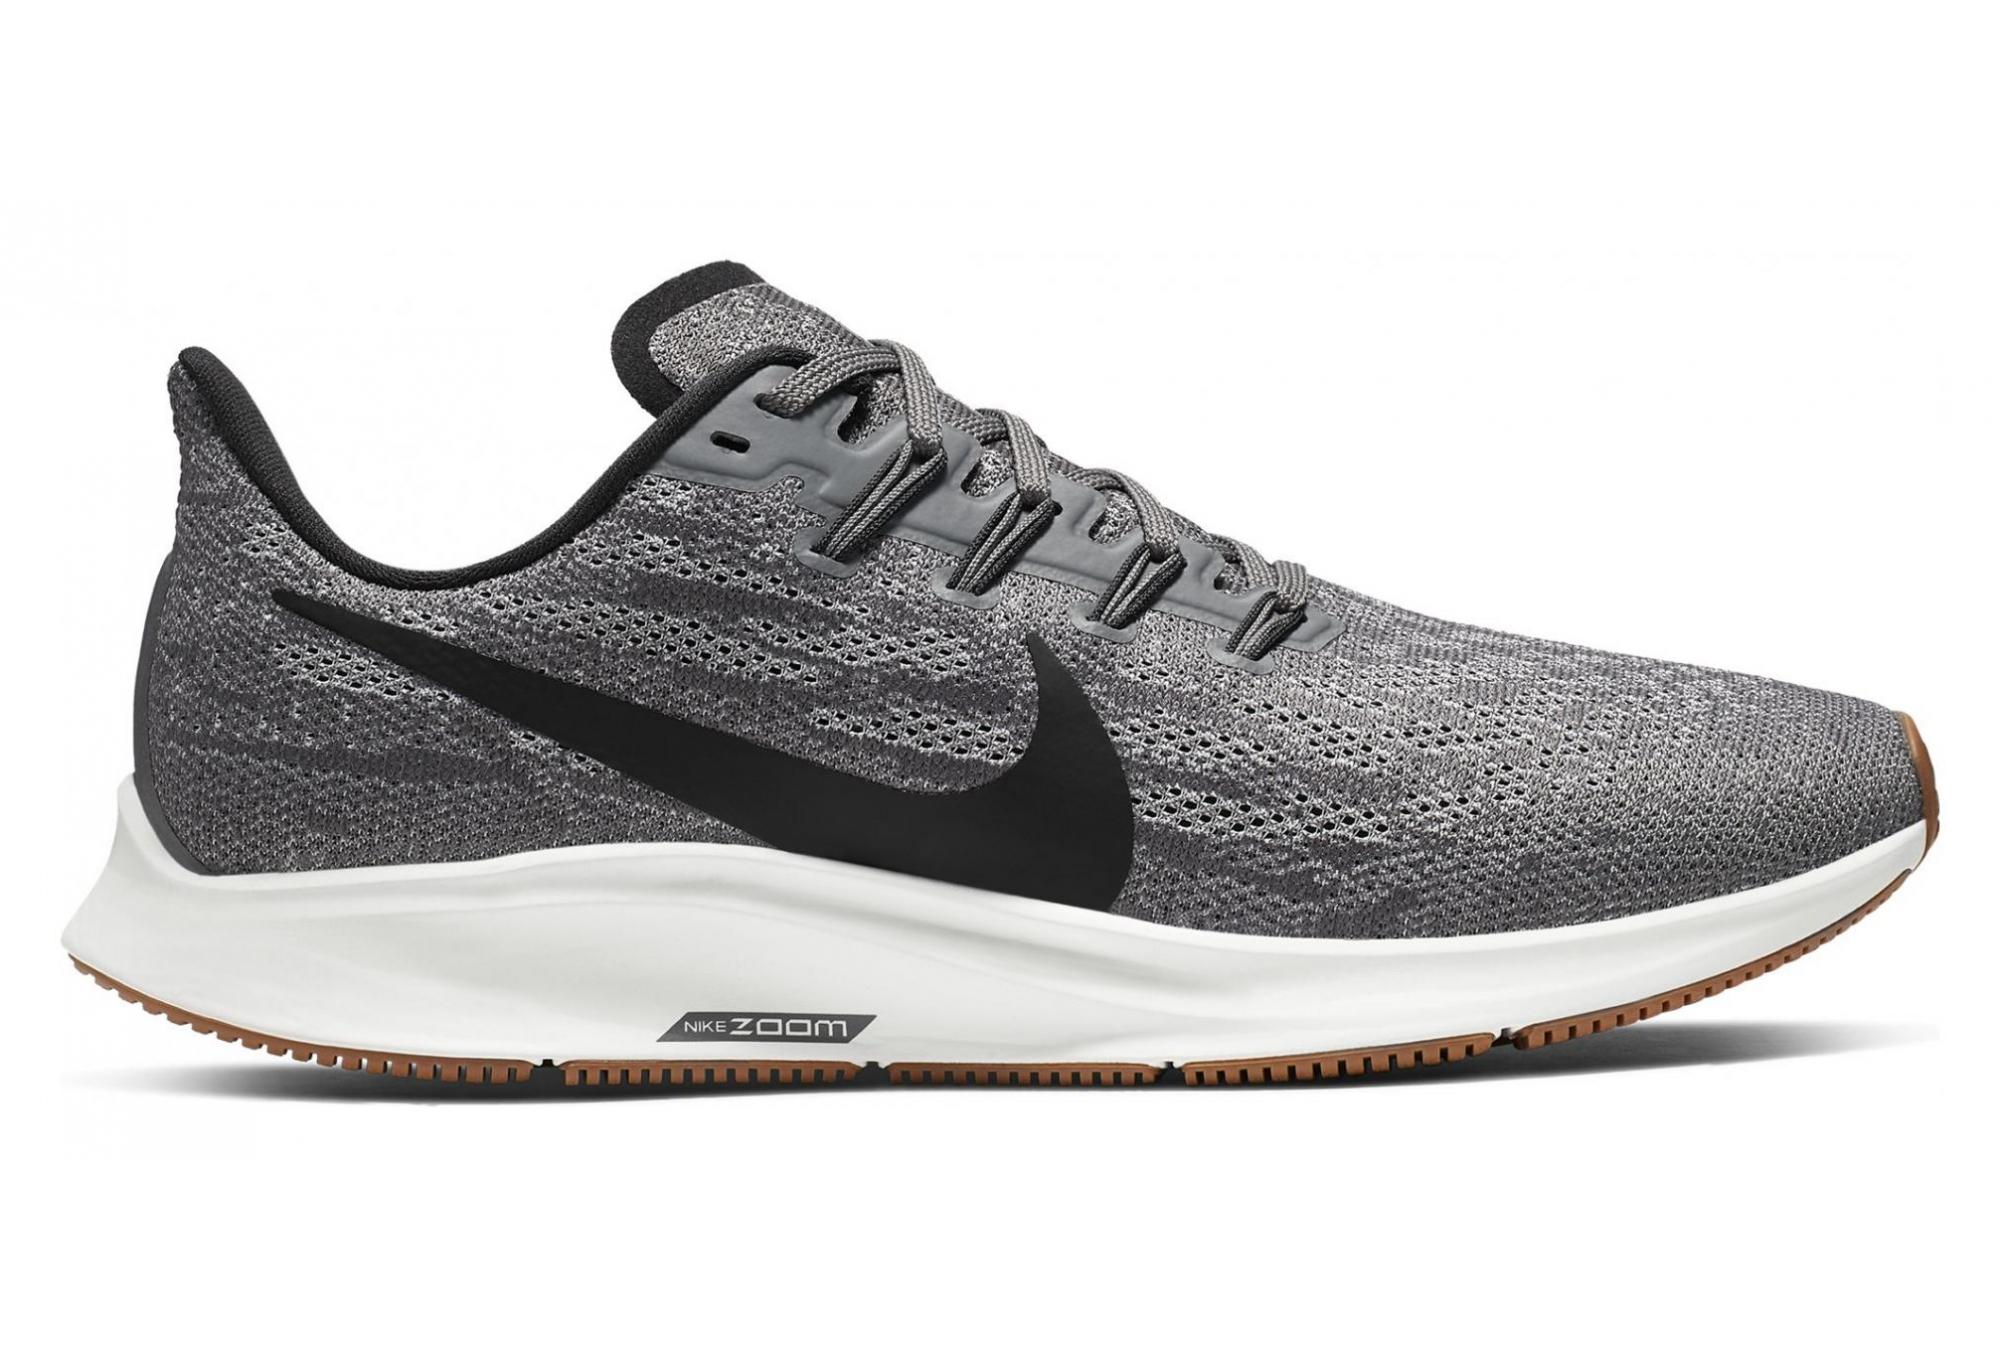 high quality authentic cheaper Nike Air Zoom Pegasus 36 Grey Women